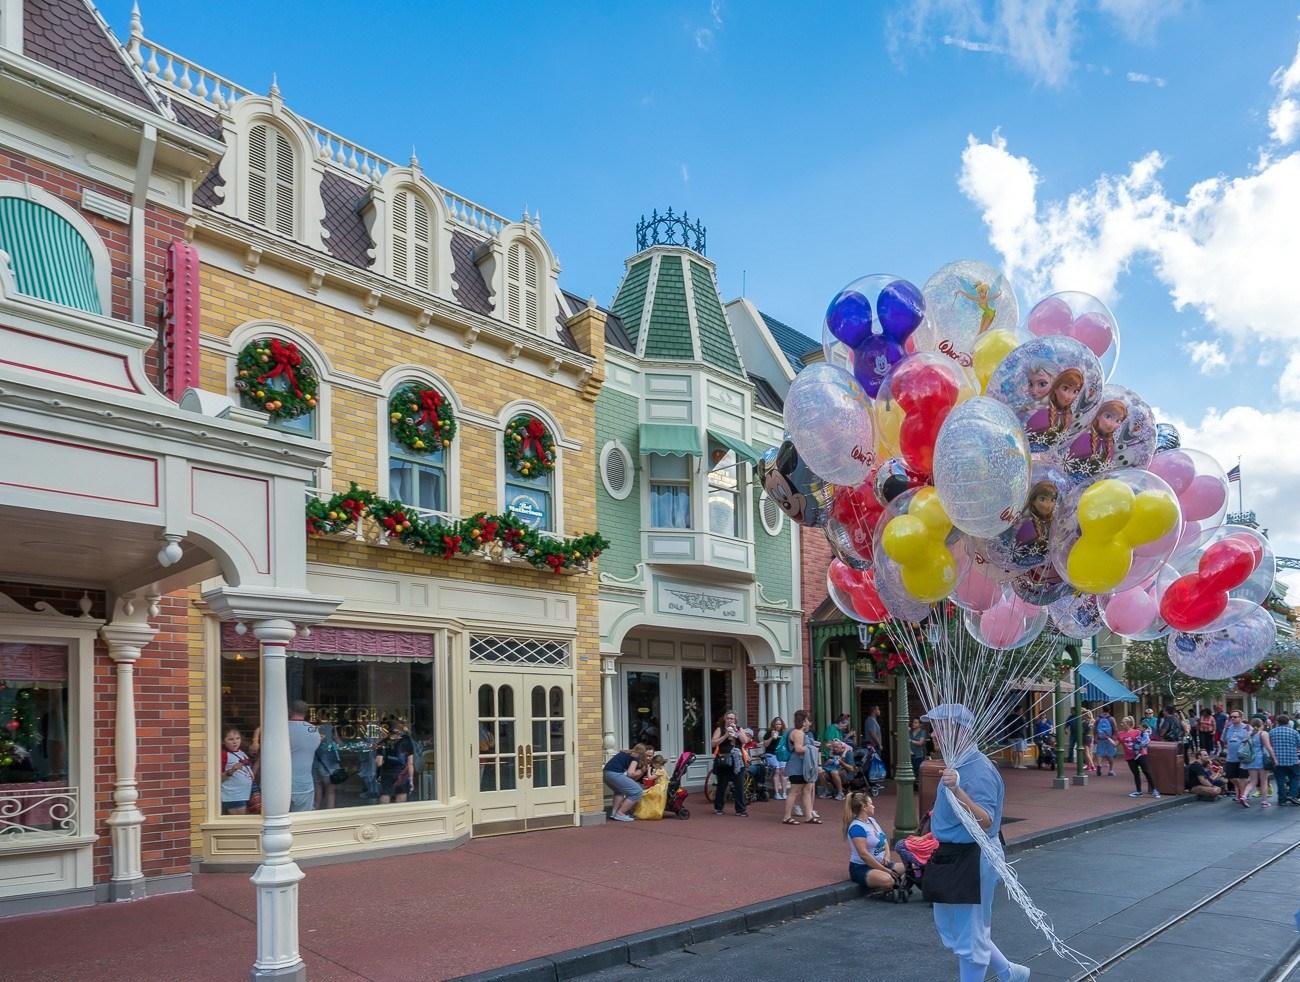 Balloons on Main Street U.S.A. at Walt Disney World's Magic Kingdom.